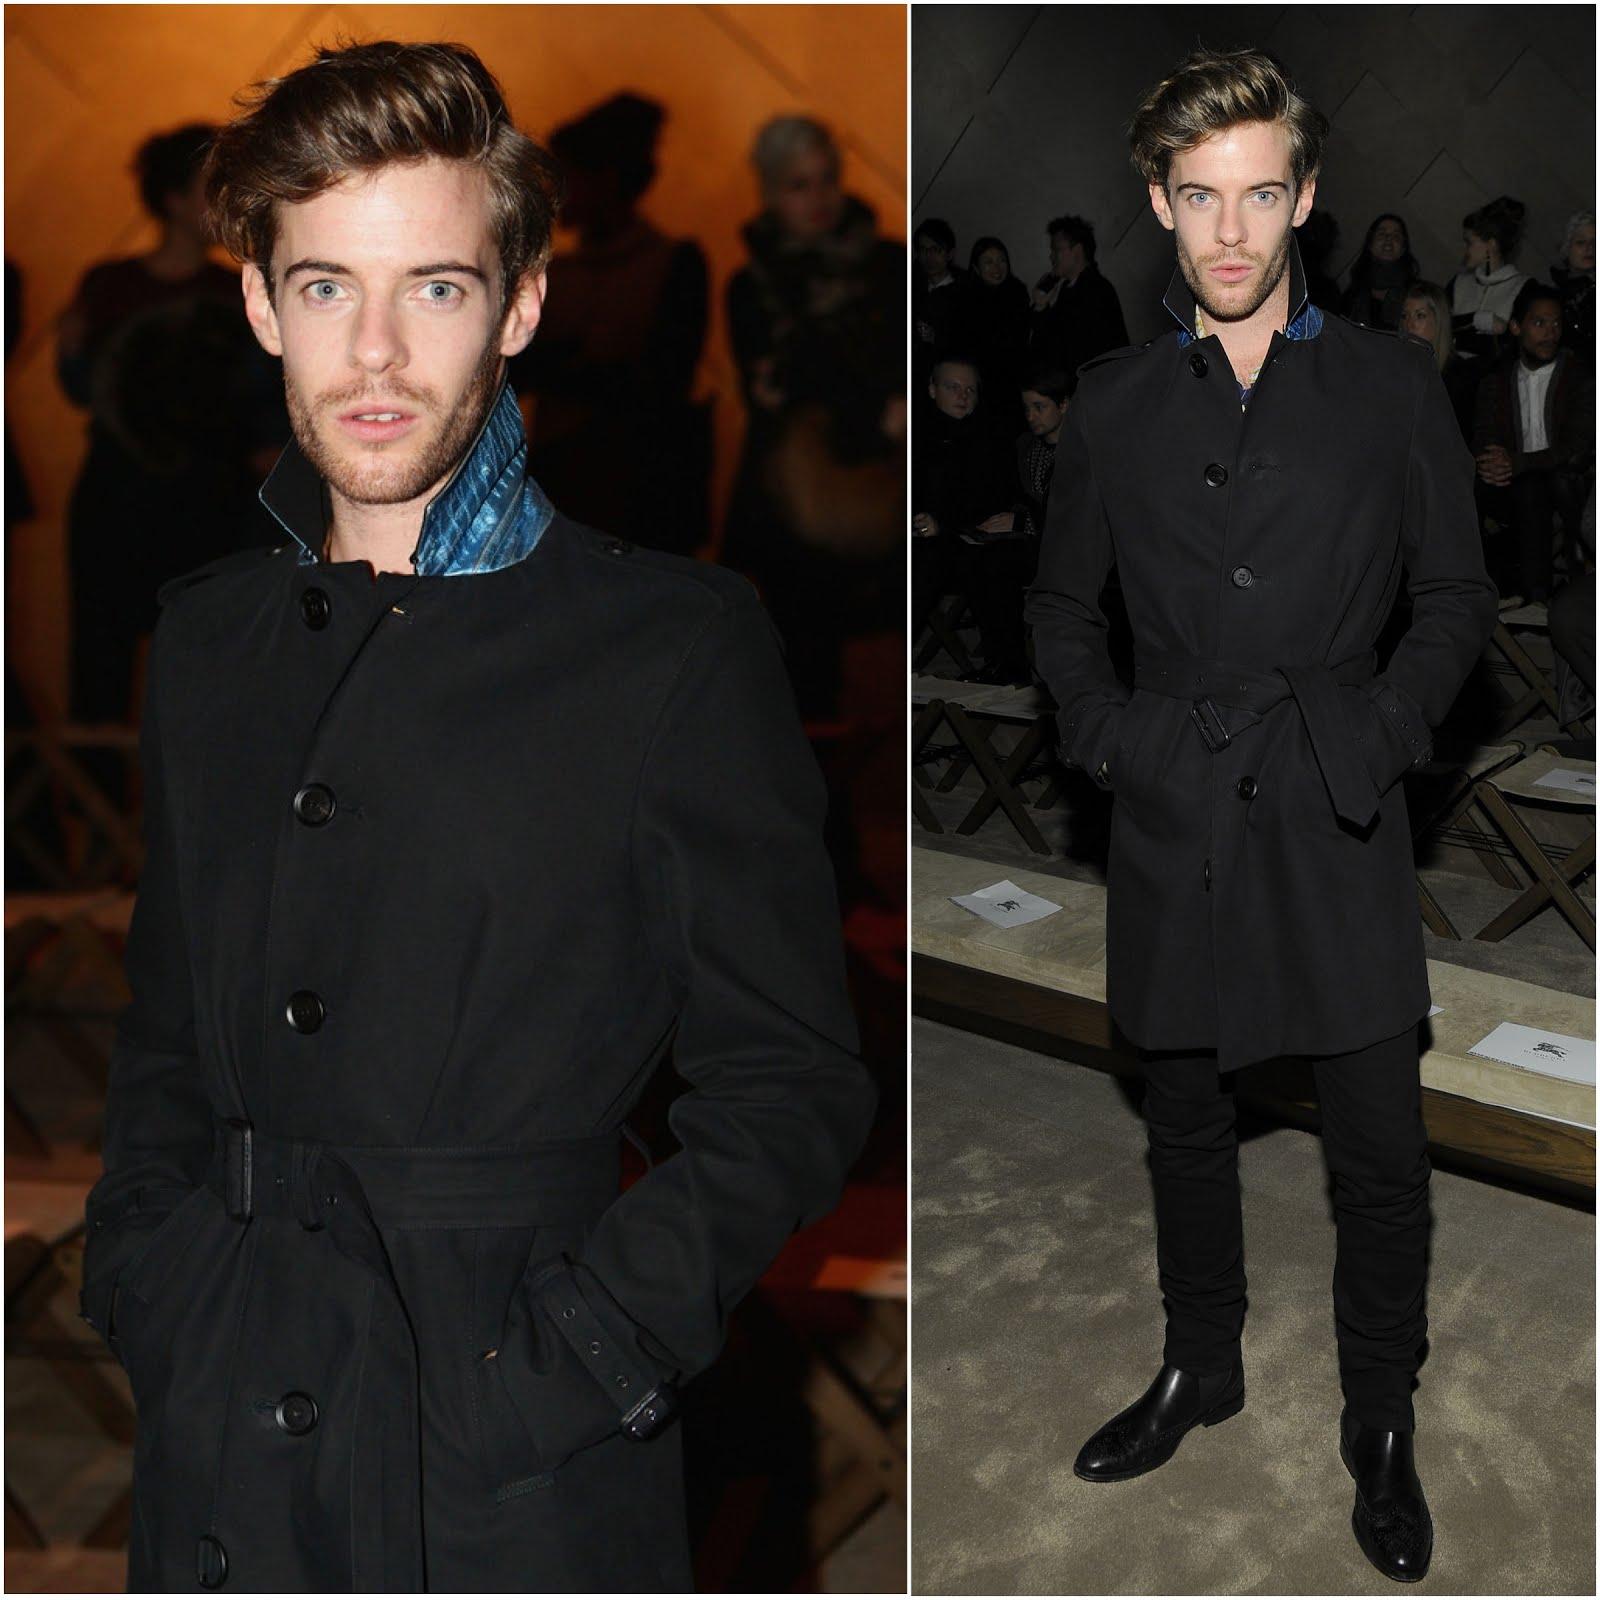 00O00 Menswear Blog Harry Treadaway in Burberry - Burberry Prorsum Menswear FW2013, #MFW